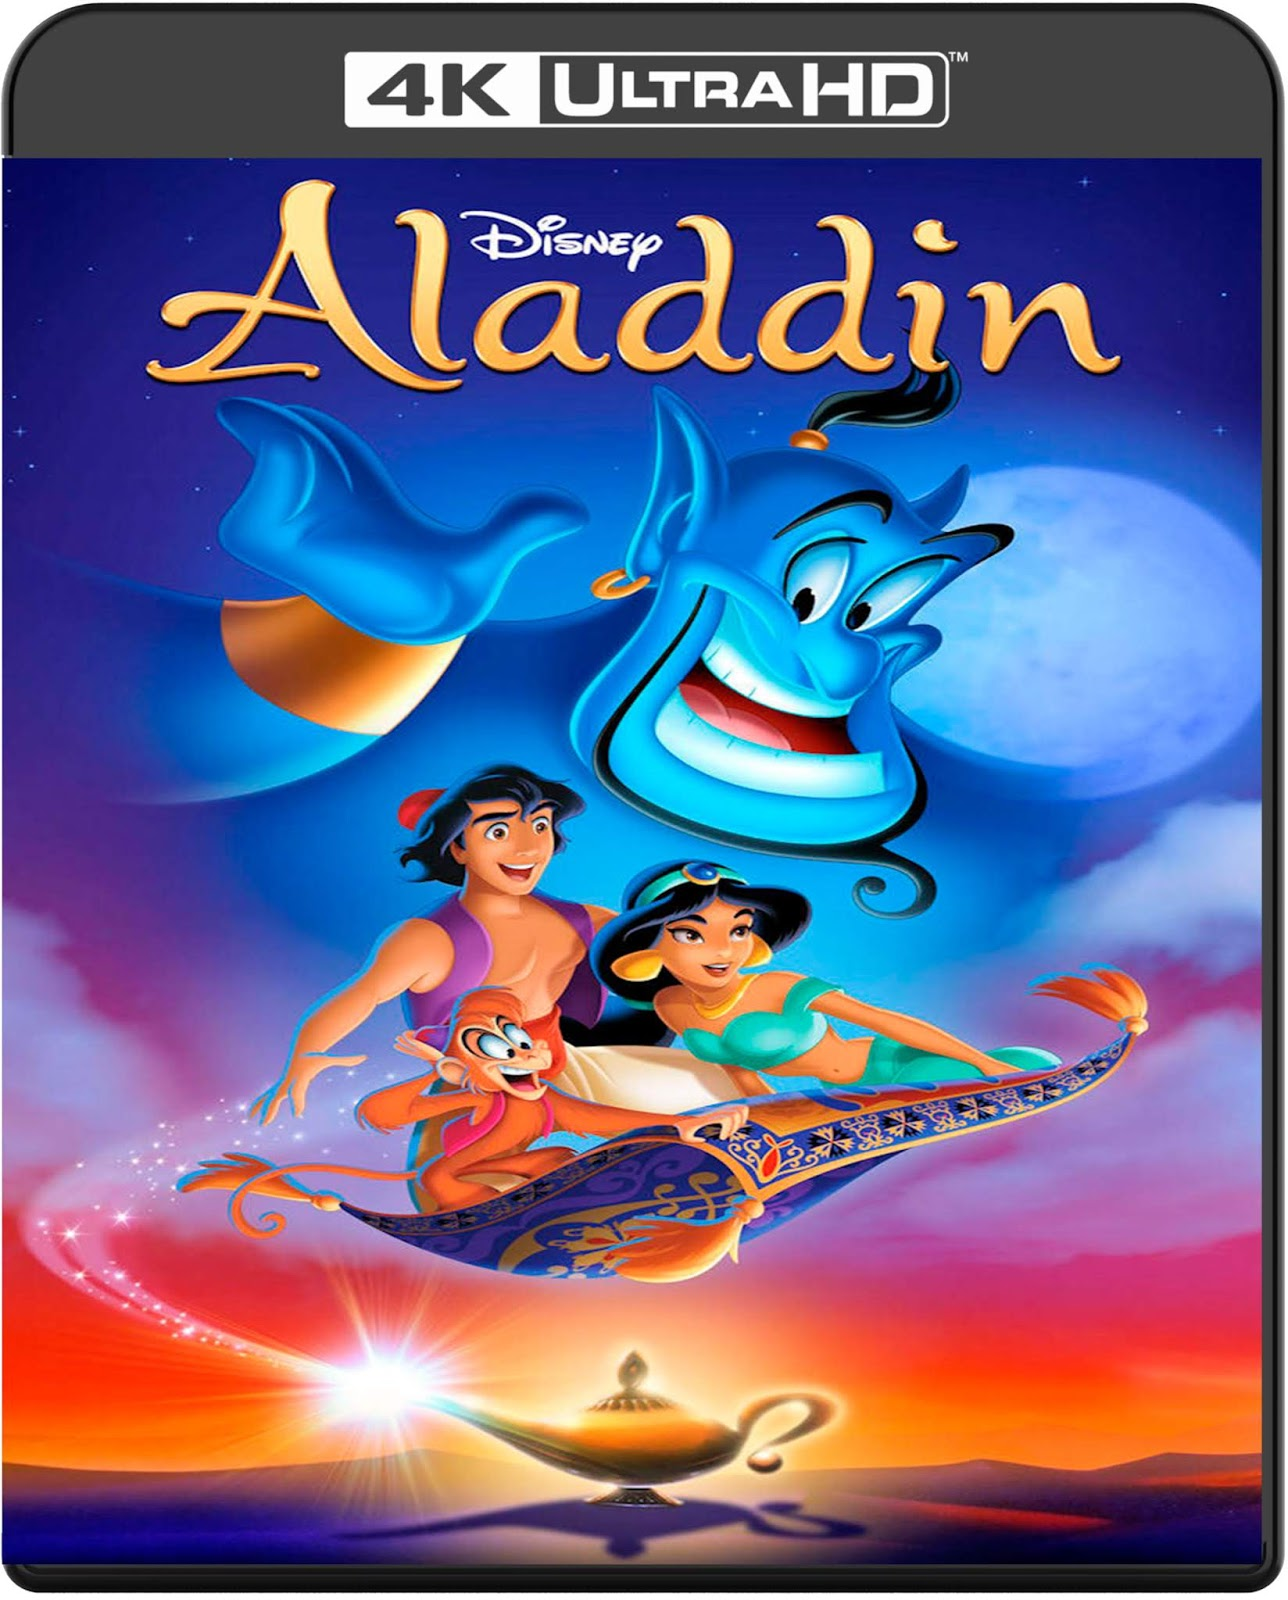 Aladdin [1992] [UHD] [2160p] [Latino]